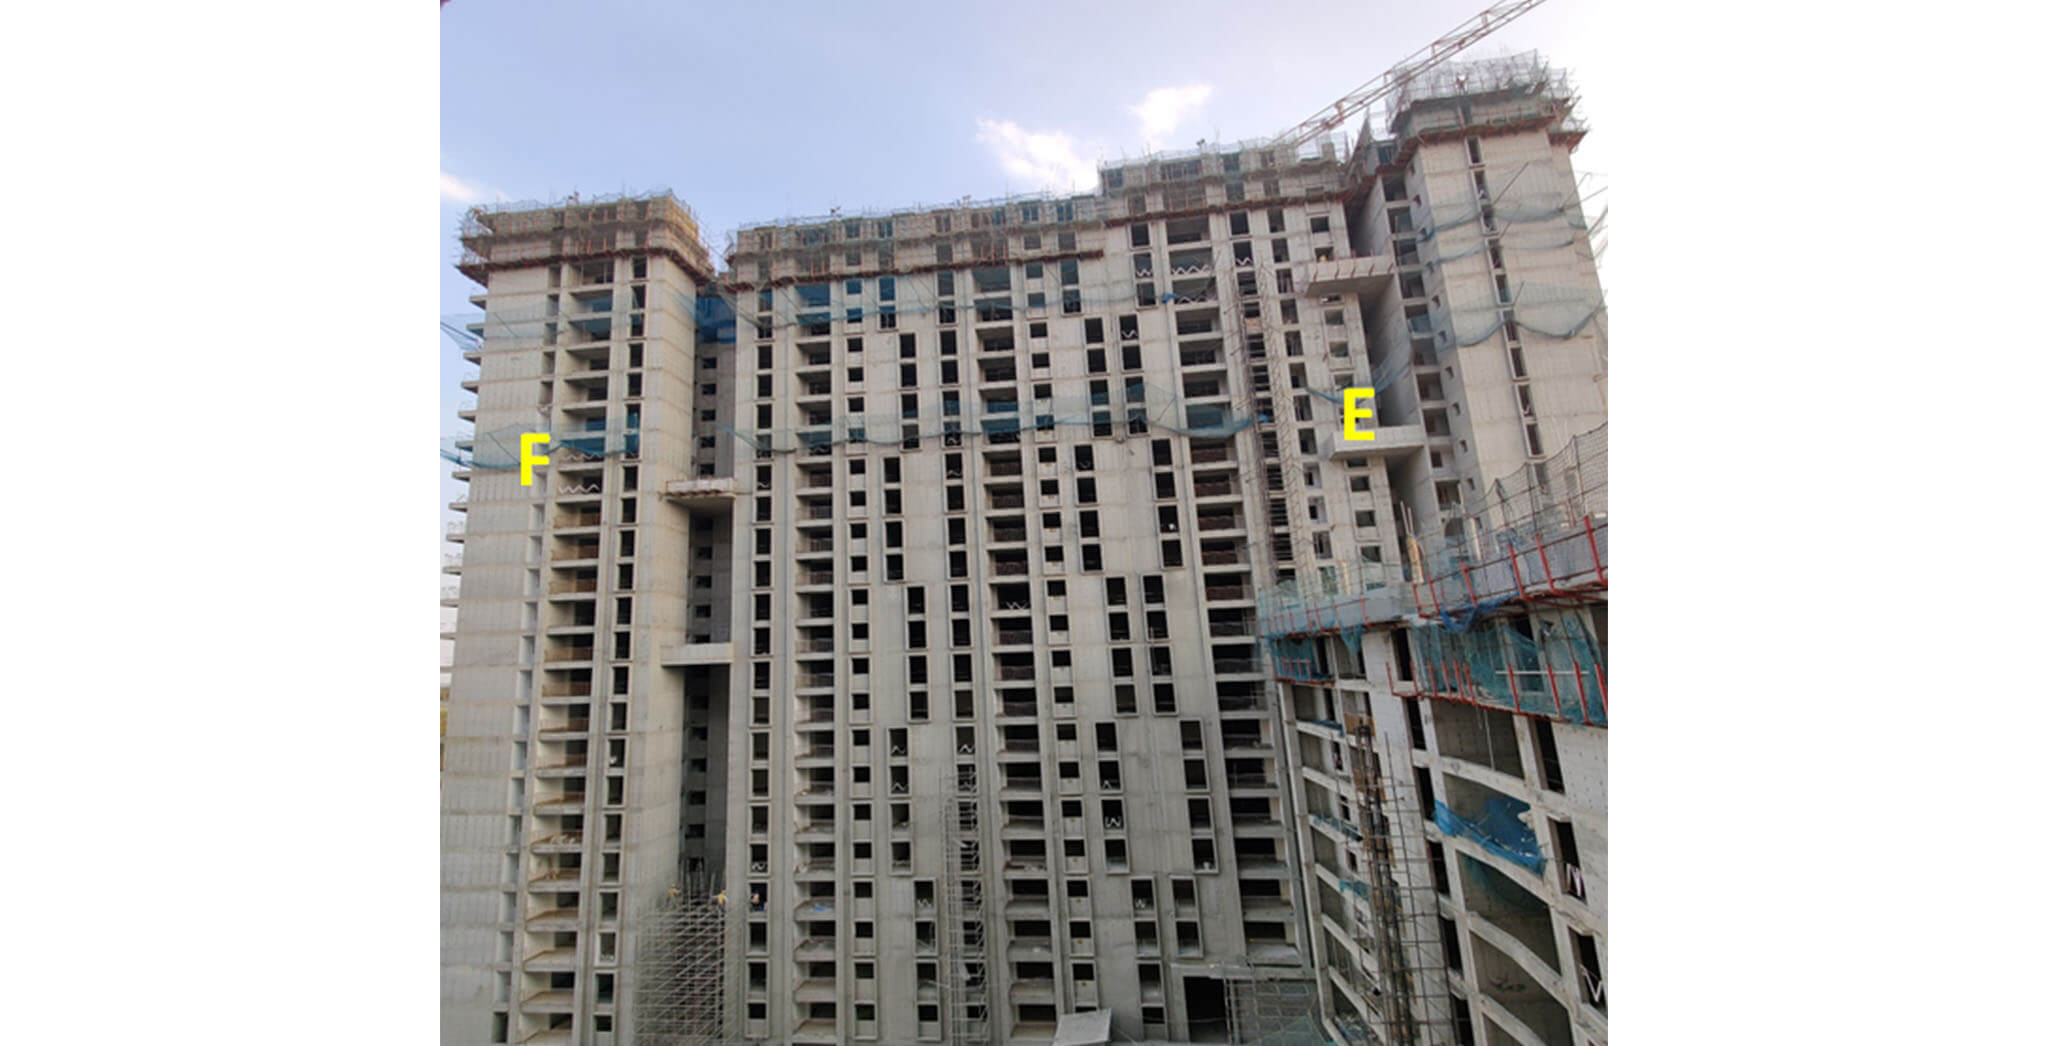 Feb 2021 - Serene: Tower E—25th floor slab structure work-in-progress; Tower F—25th floor slab structure work-in-progress